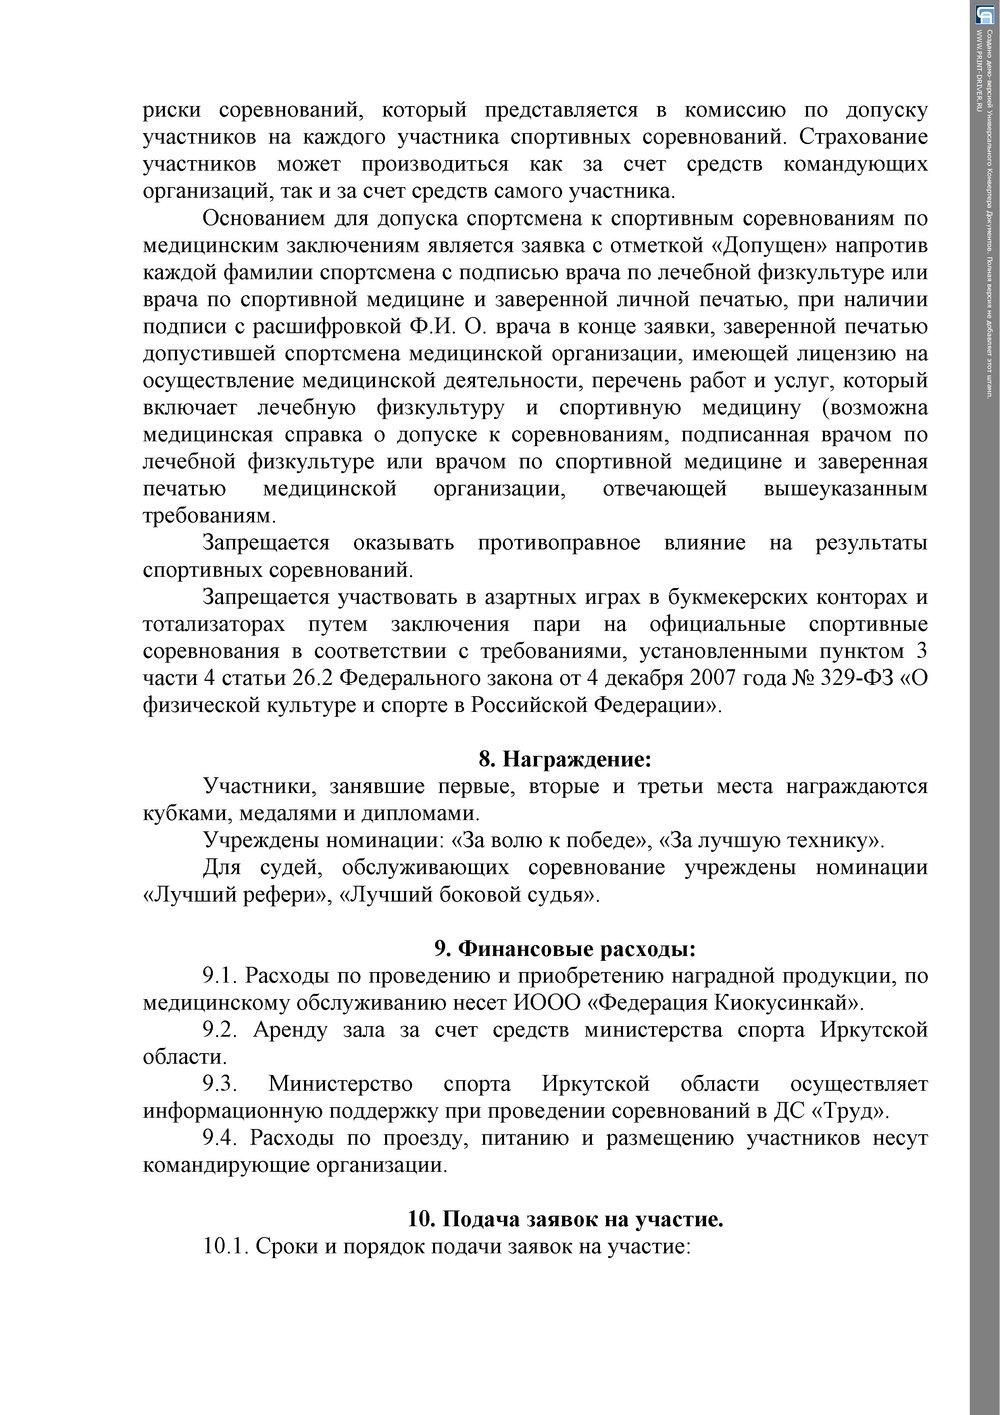 Кубок мужества согл мин(6).jpg